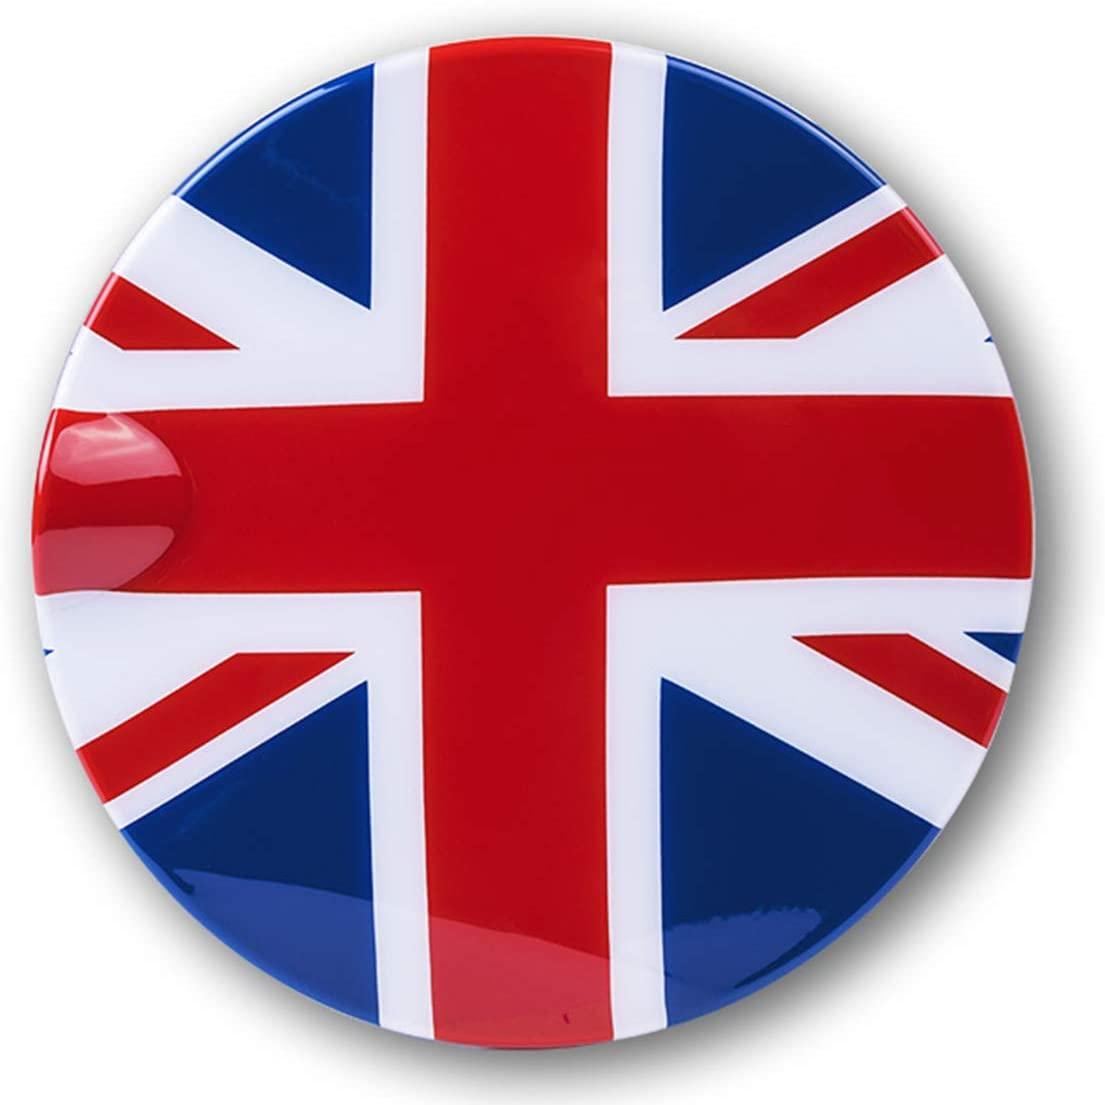 HDX Red/Blue Union Jack UK Flag ABS Sticker Cover Trim Cap for Mini Cooper ONE S JCW R Series R60 Countryman R61 Paceman 2010-2016 (Gas Tank Door Fuel Cap)